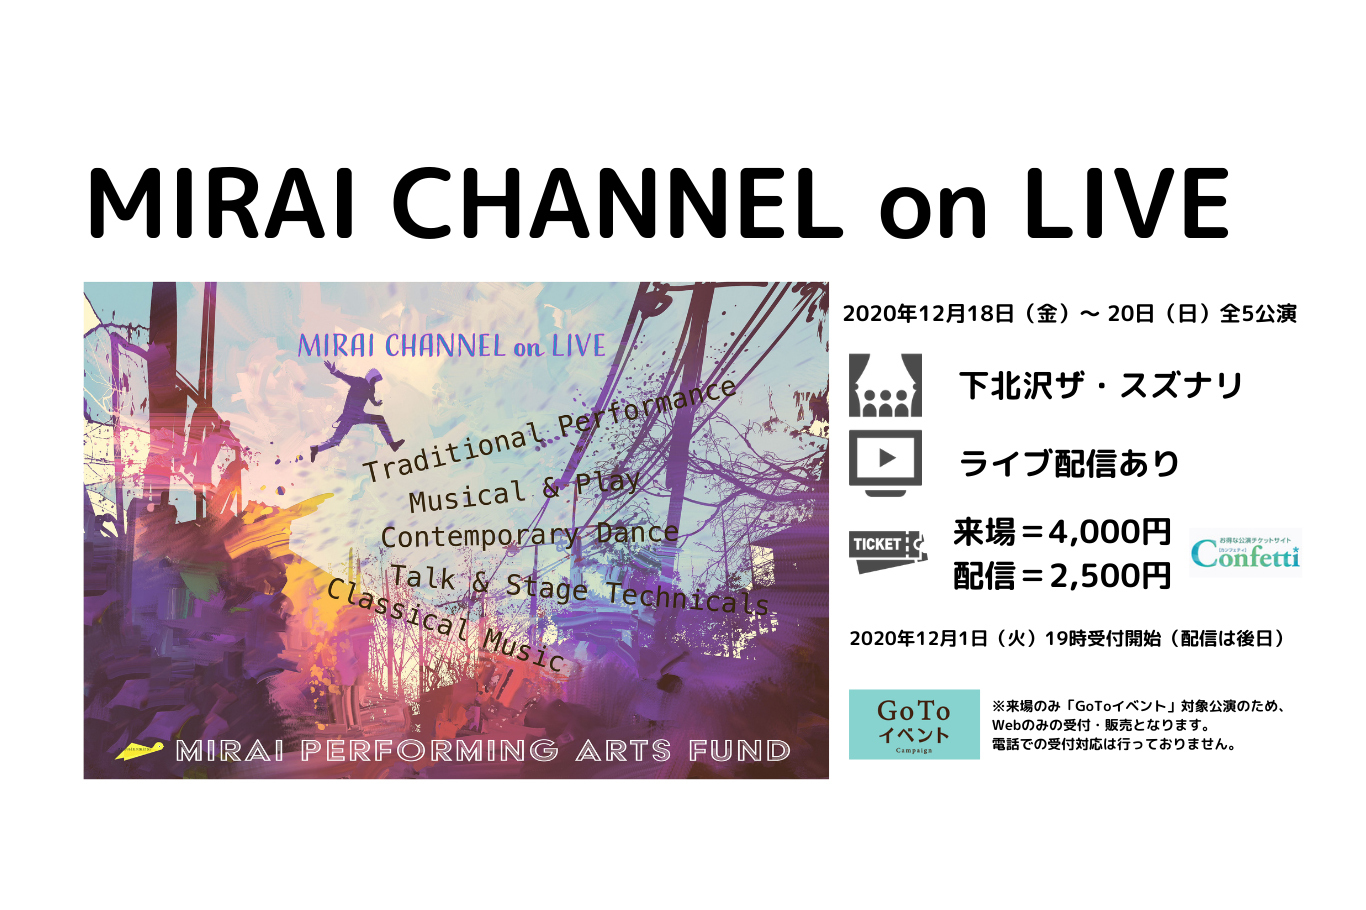 Mirai CHANNEL on LIVE